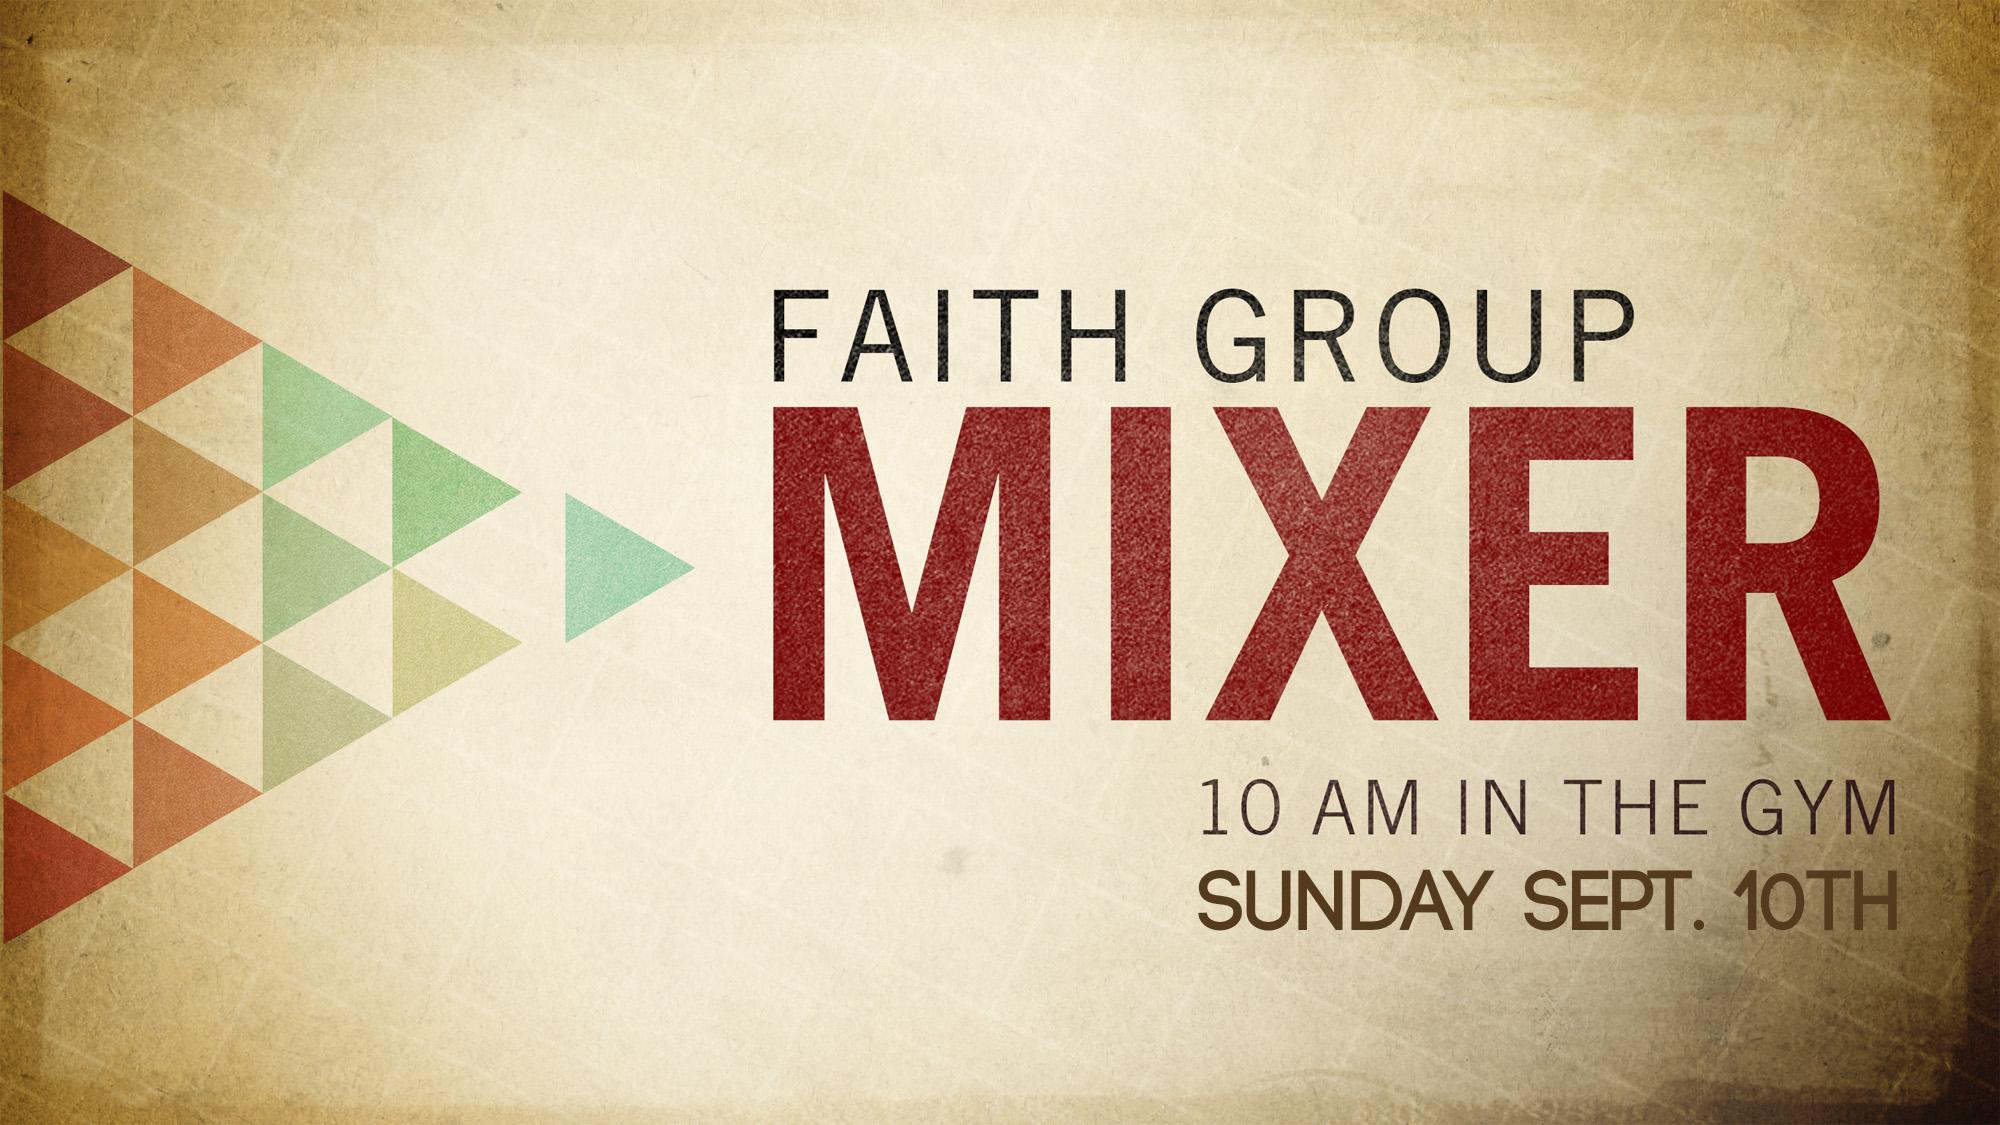 Faith_Group_Mixer_WIDE-TITLE-1 copy.jpg